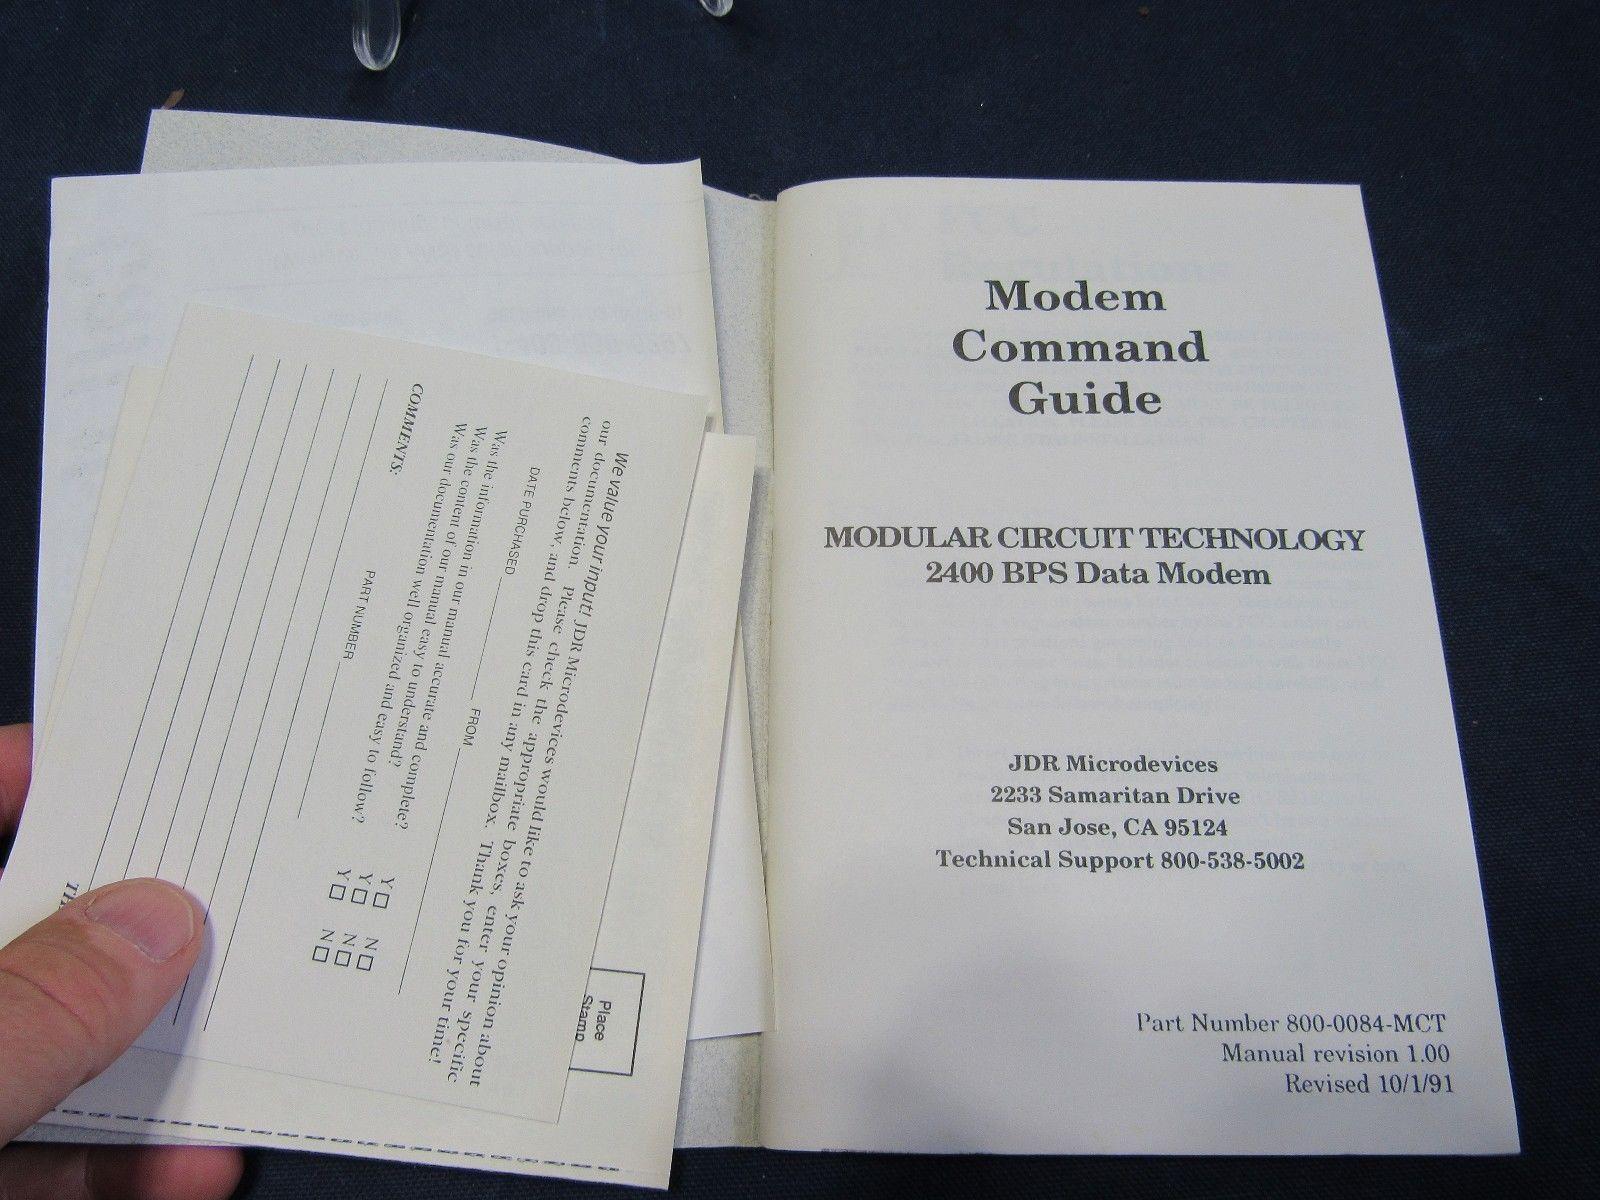 VTG Modem Command Guide 2400 BPS Data Modem JDR Microdevices Modular Circuit